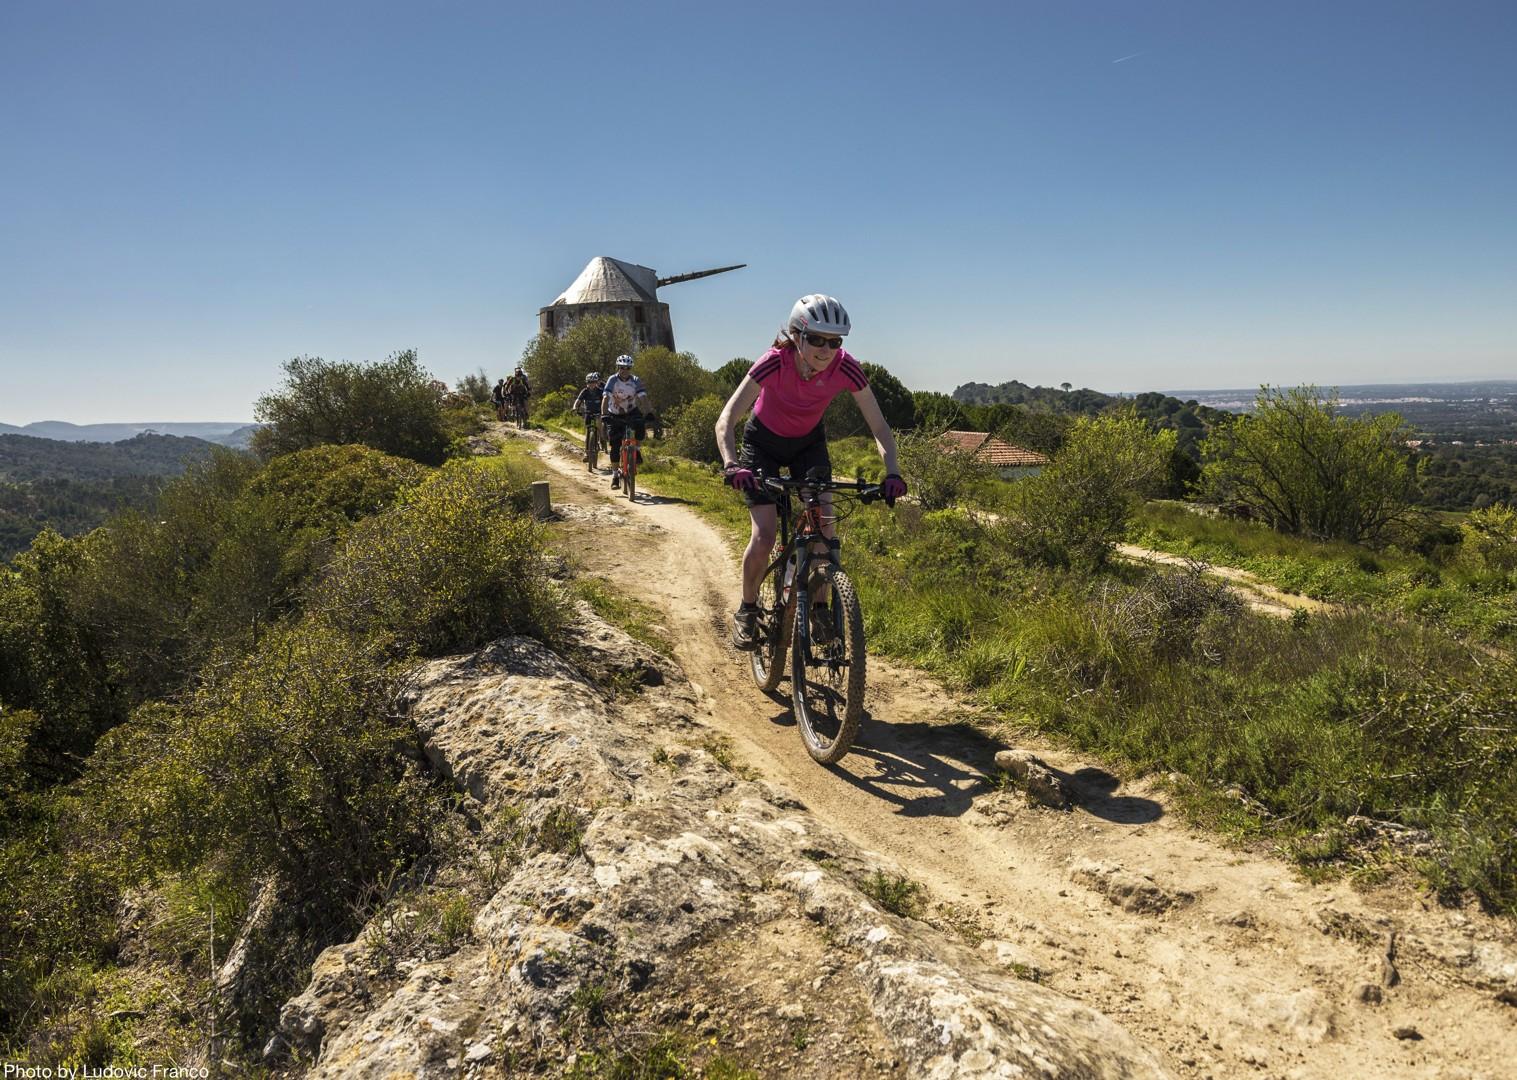 rural-singletrack-mountain-biking-cycling-holiday-atlantic-trails-portugal.jpg - Portugal - Atlantic Trails - Guided Mountain Bike Holiday - Mountain Biking